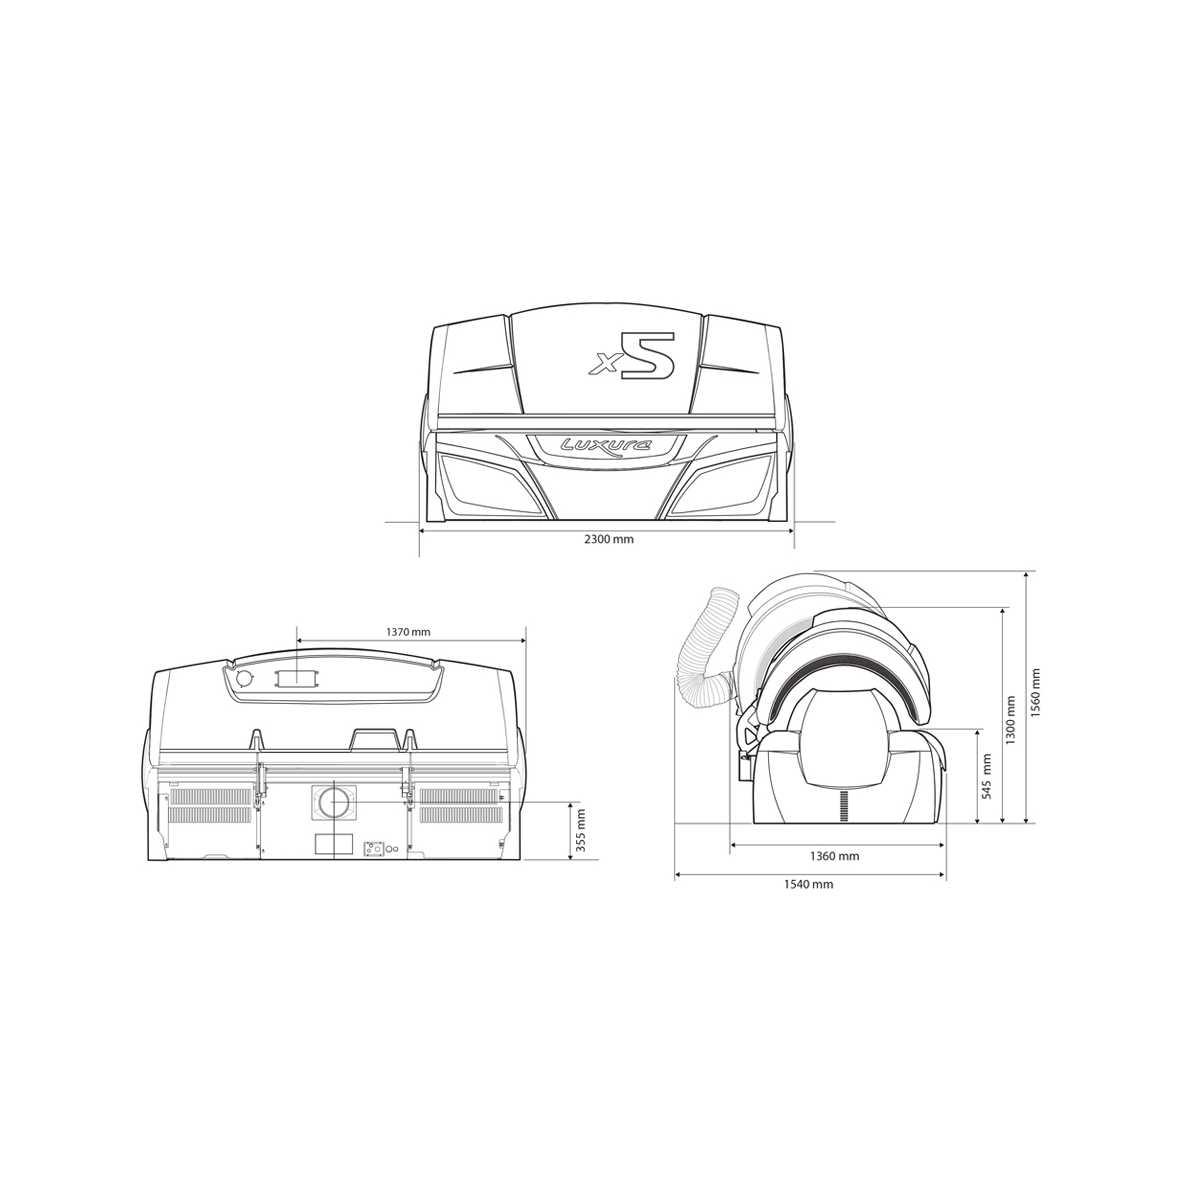 Hapro Luxura X5 34 SLI